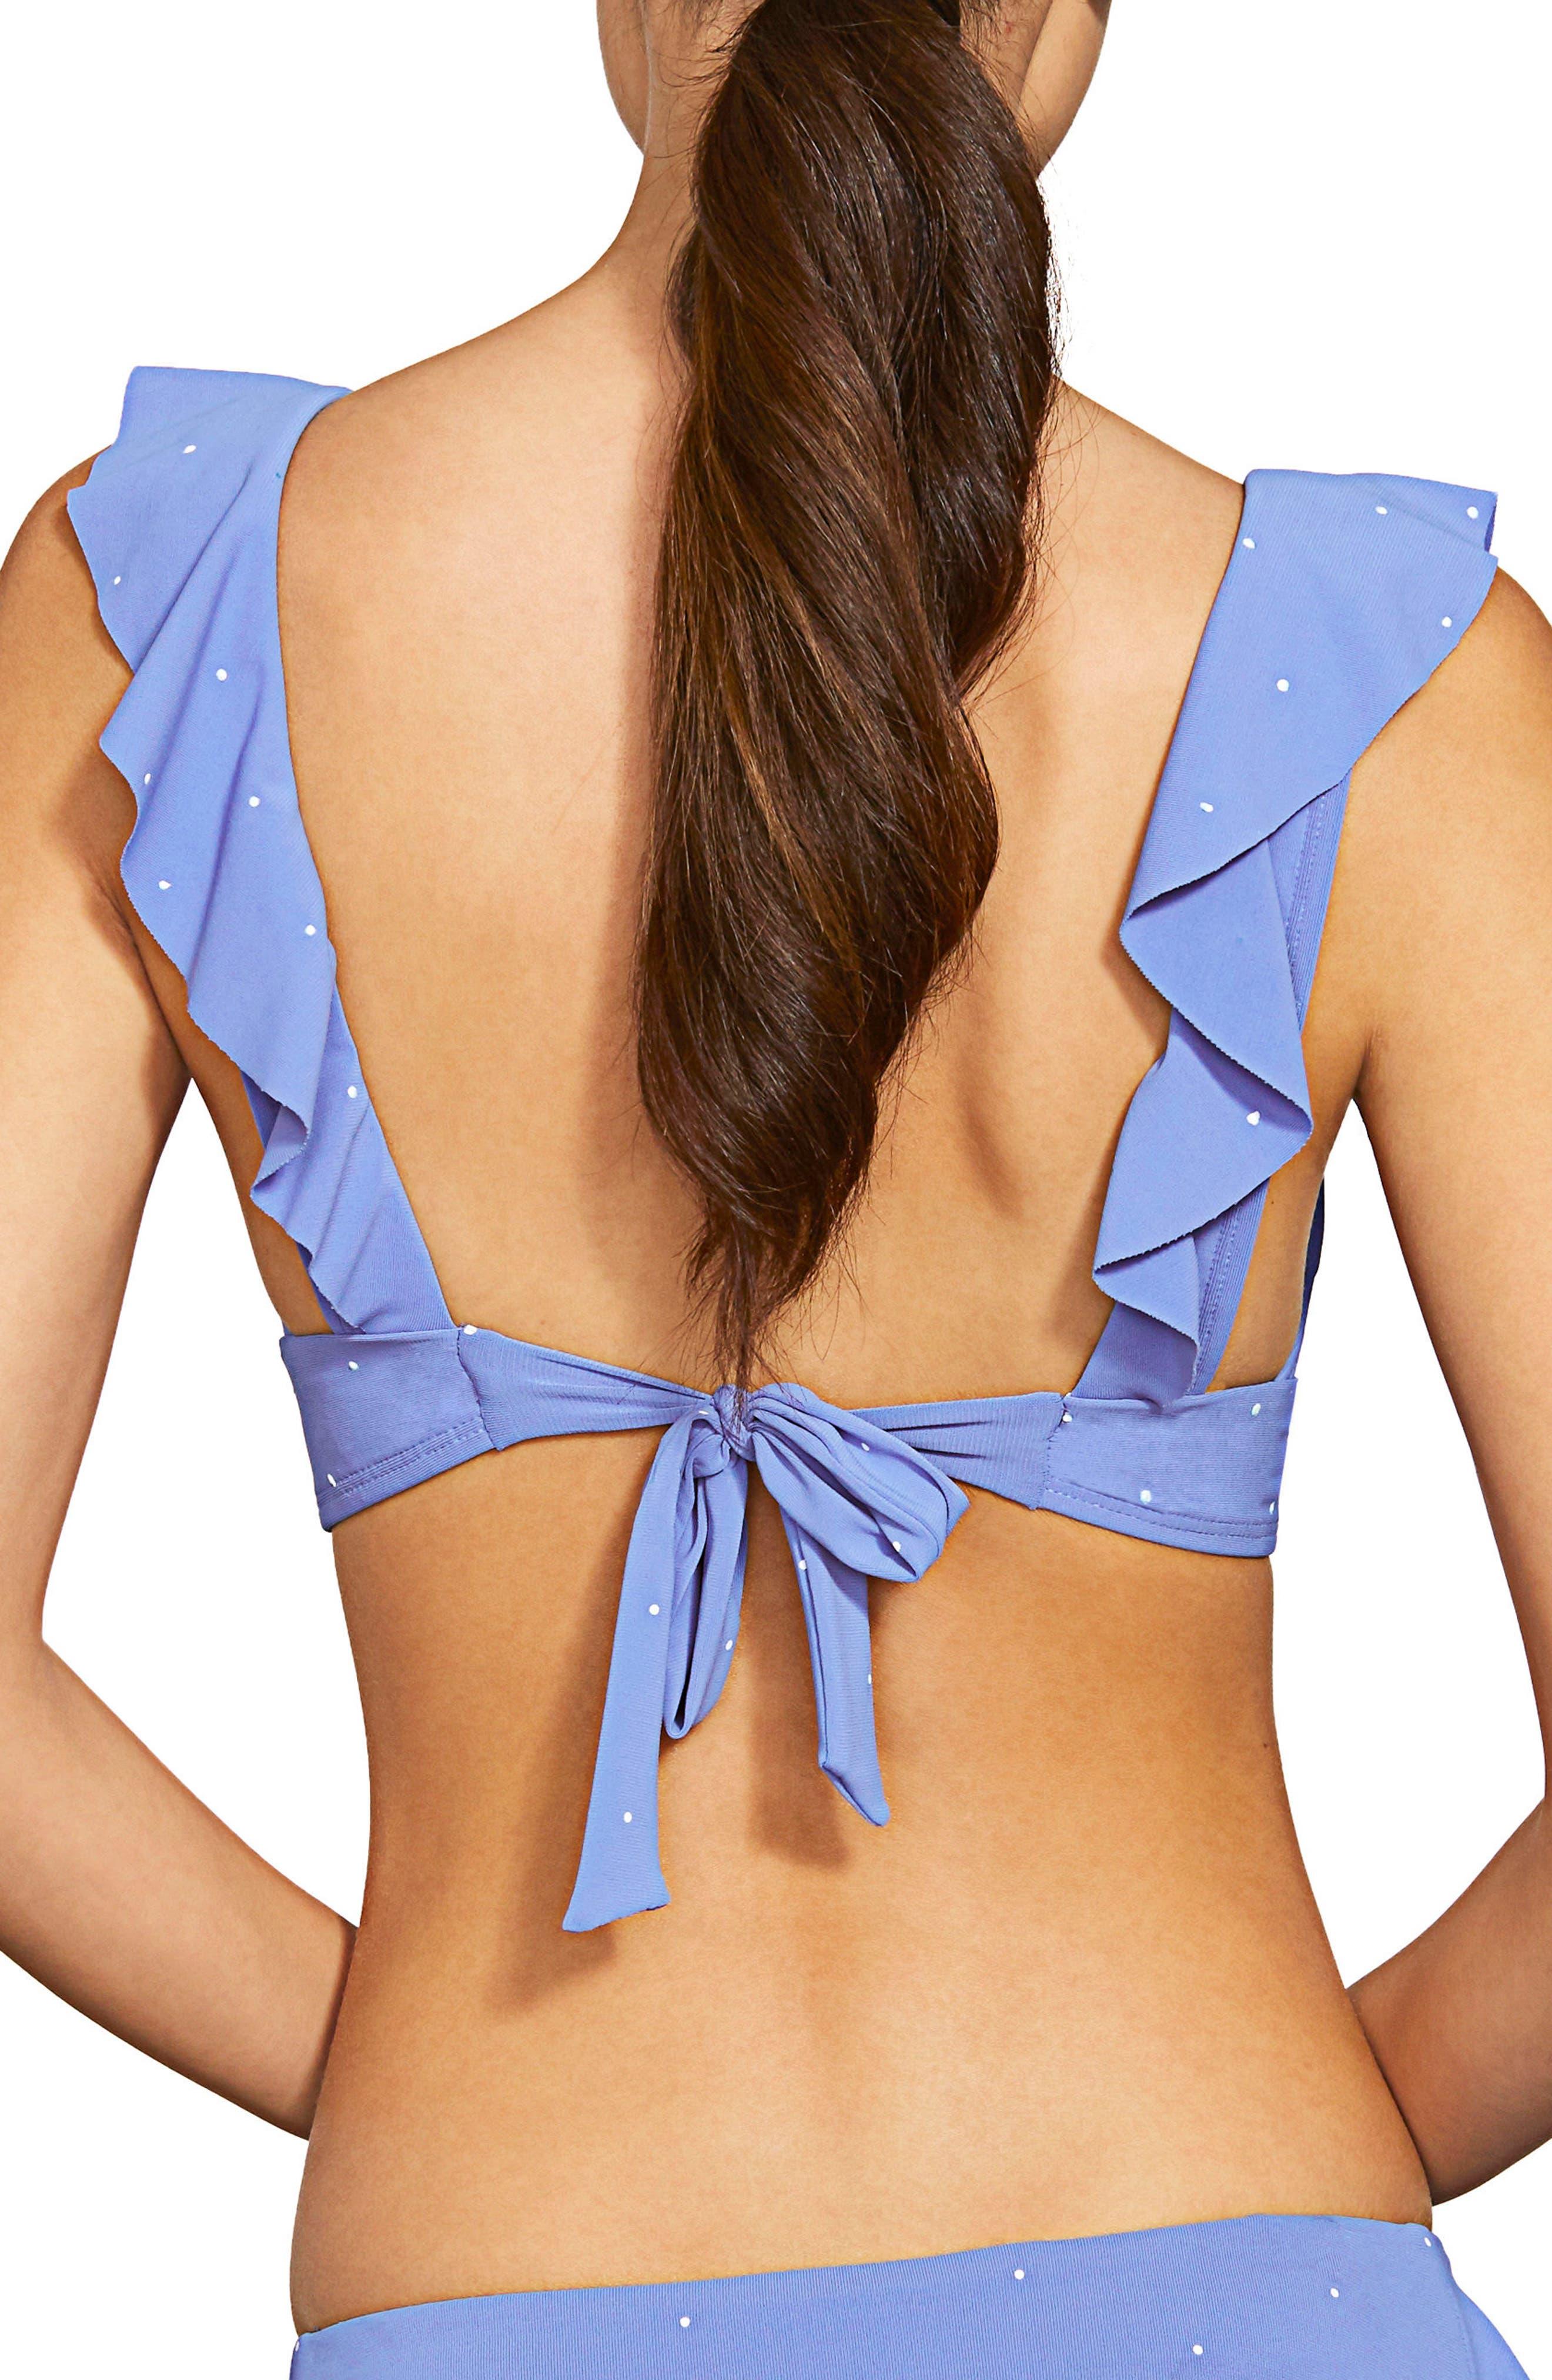 Jennie Ruffle Bikini Top,                             Alternate thumbnail 2, color,                             Periwinkle